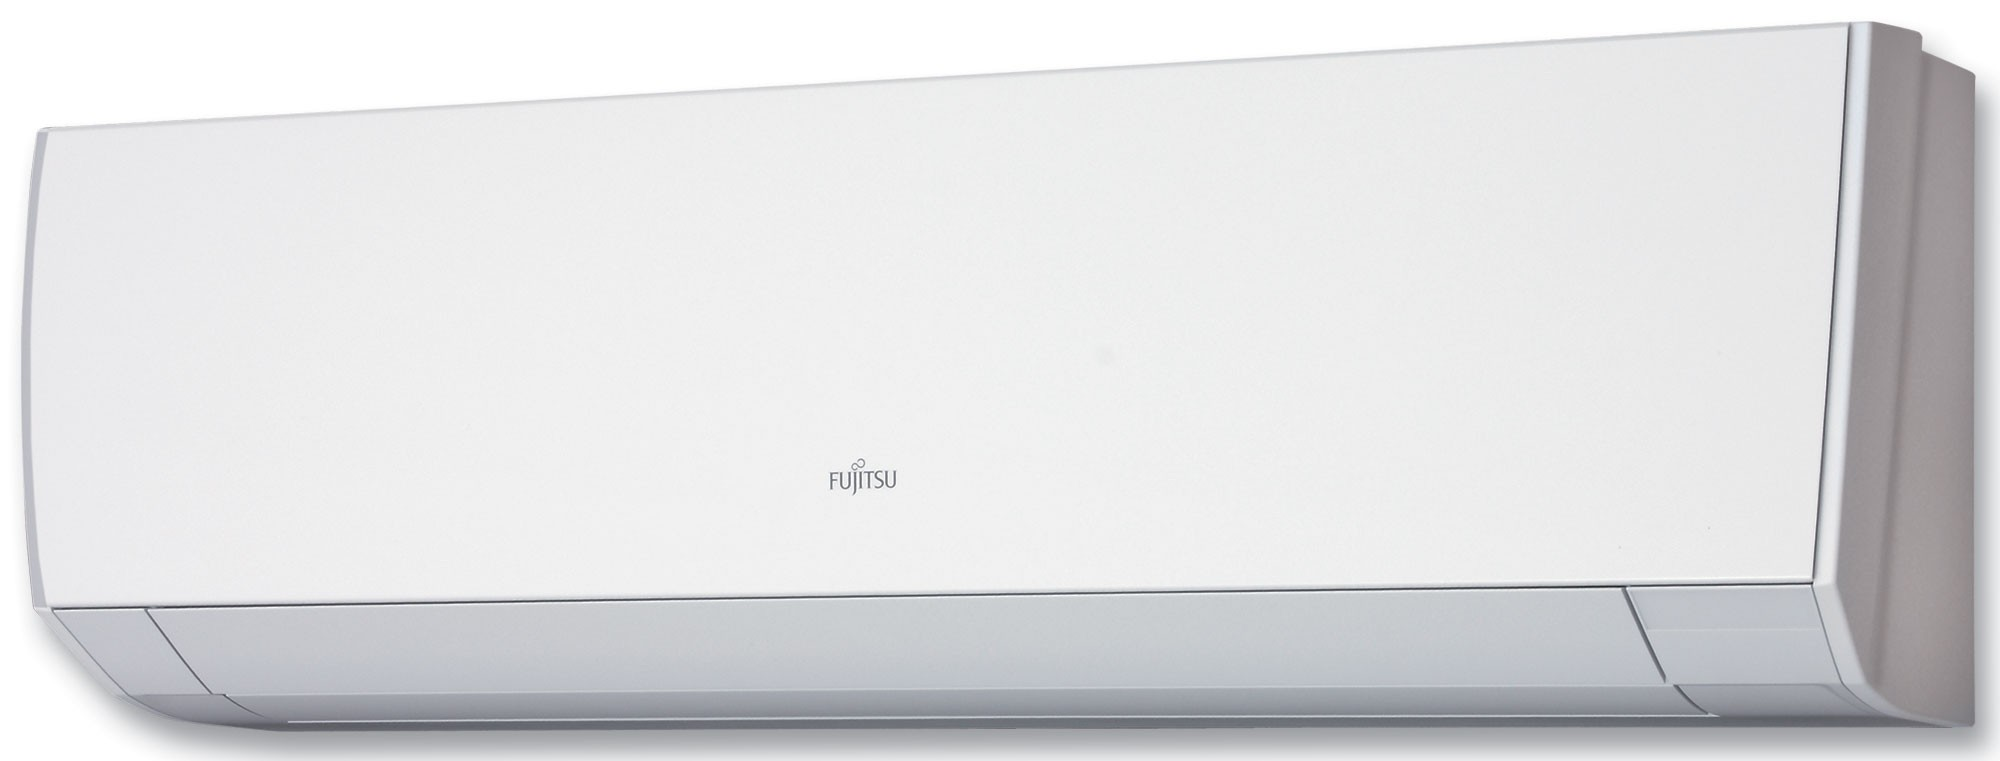 Assistência Técnica Fujitsu BH